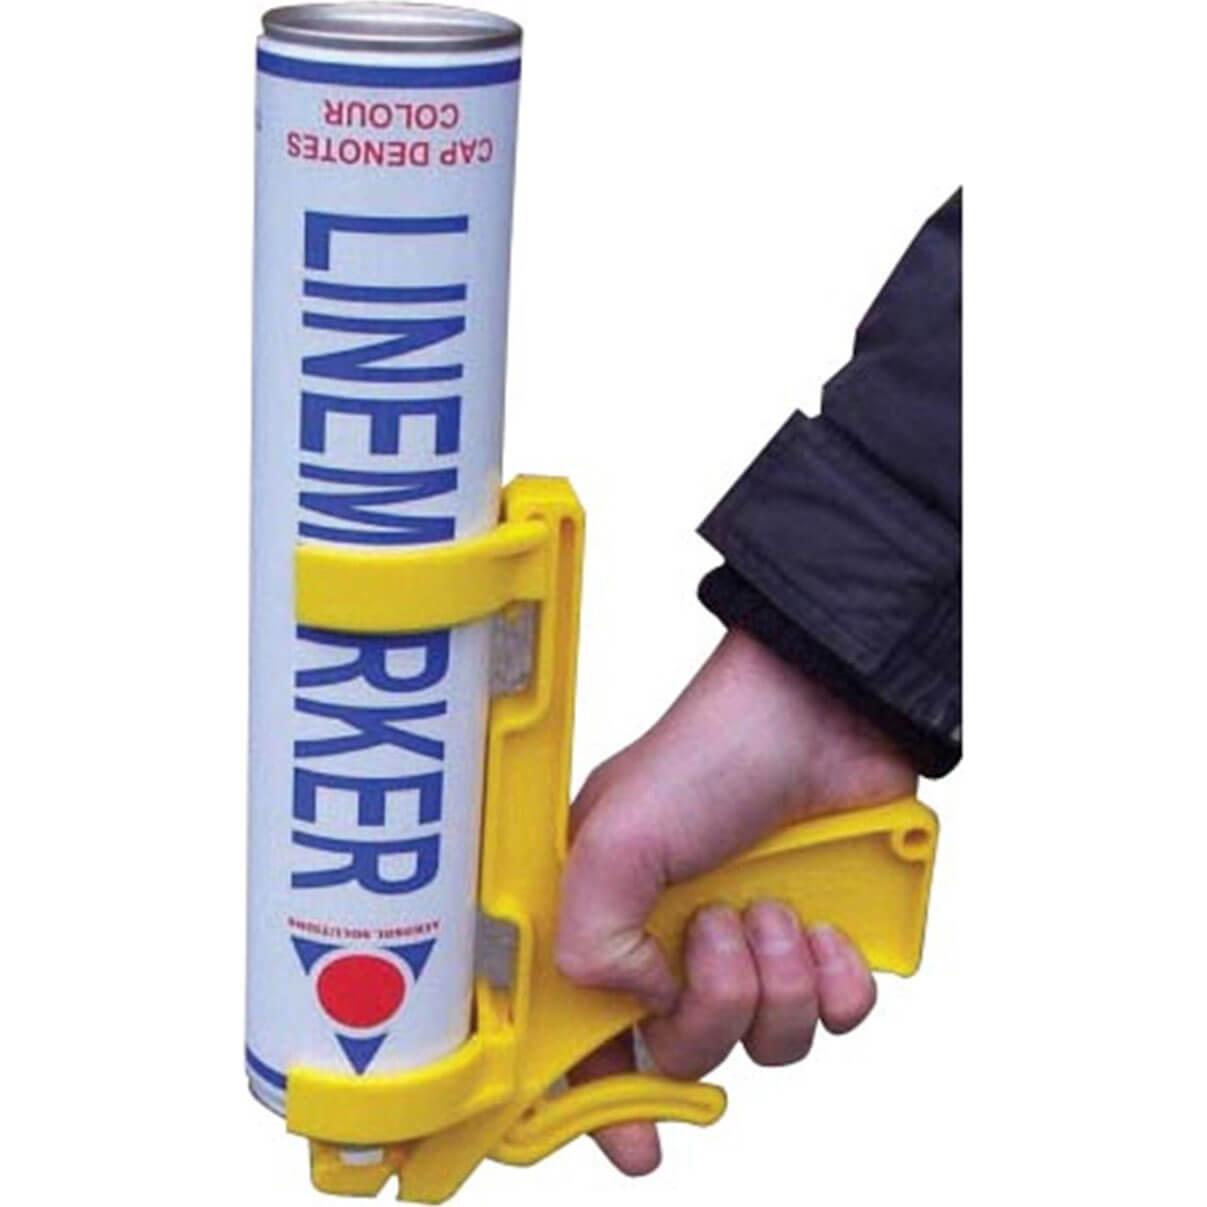 Aerosol Spraymaster ii Handheld Aerosol Applicator